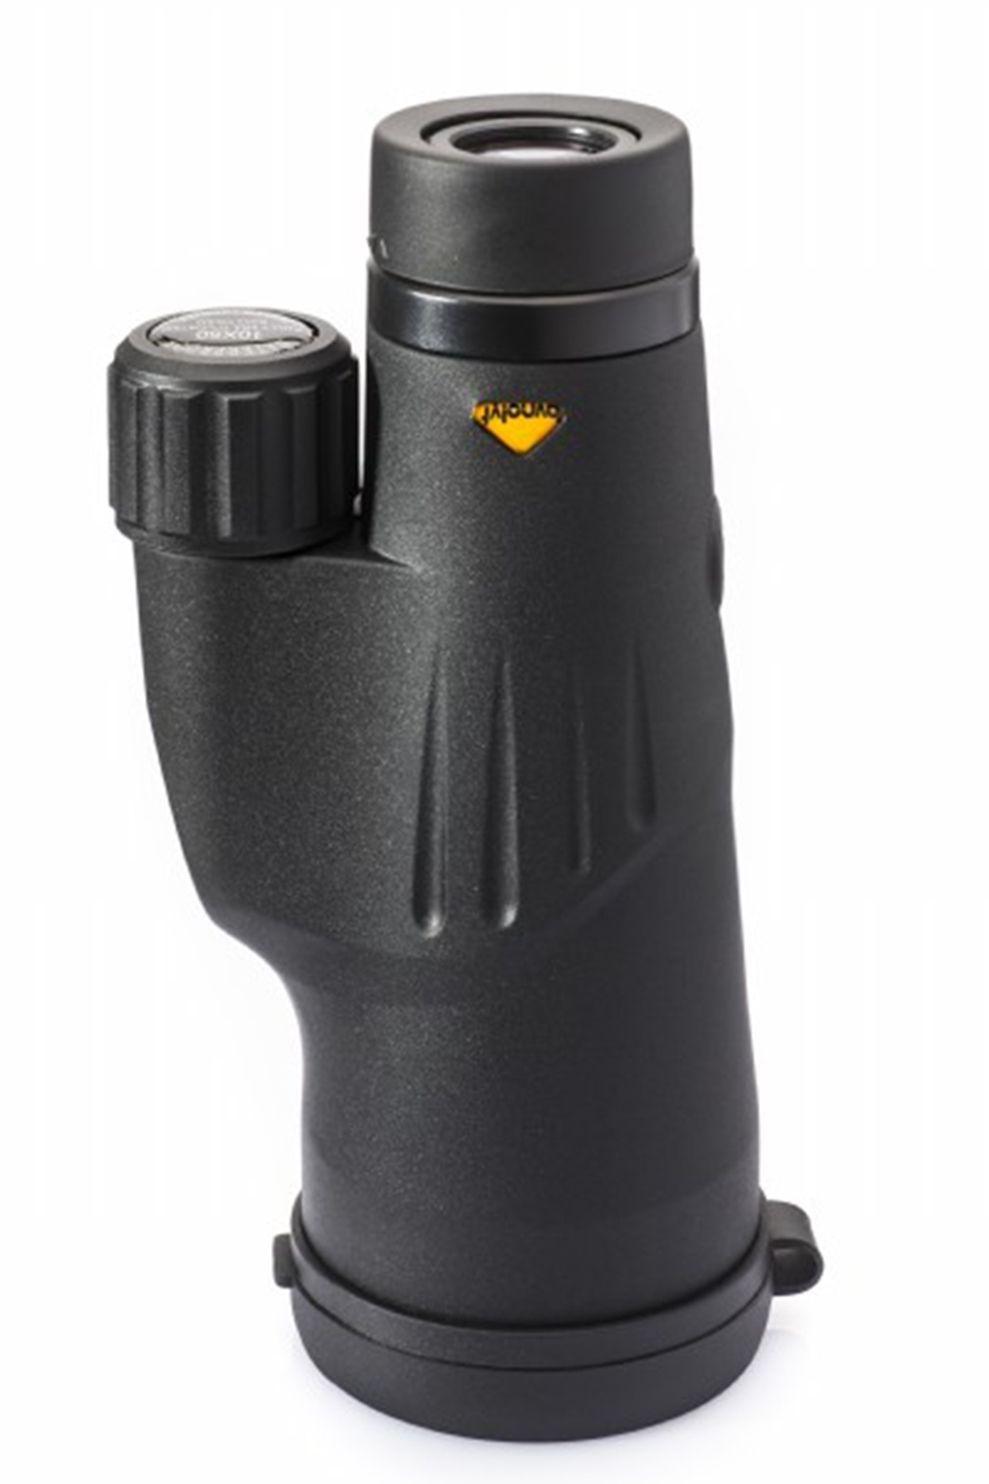 Bynolyt Monokijker Spotter 10x50 - - Transparant